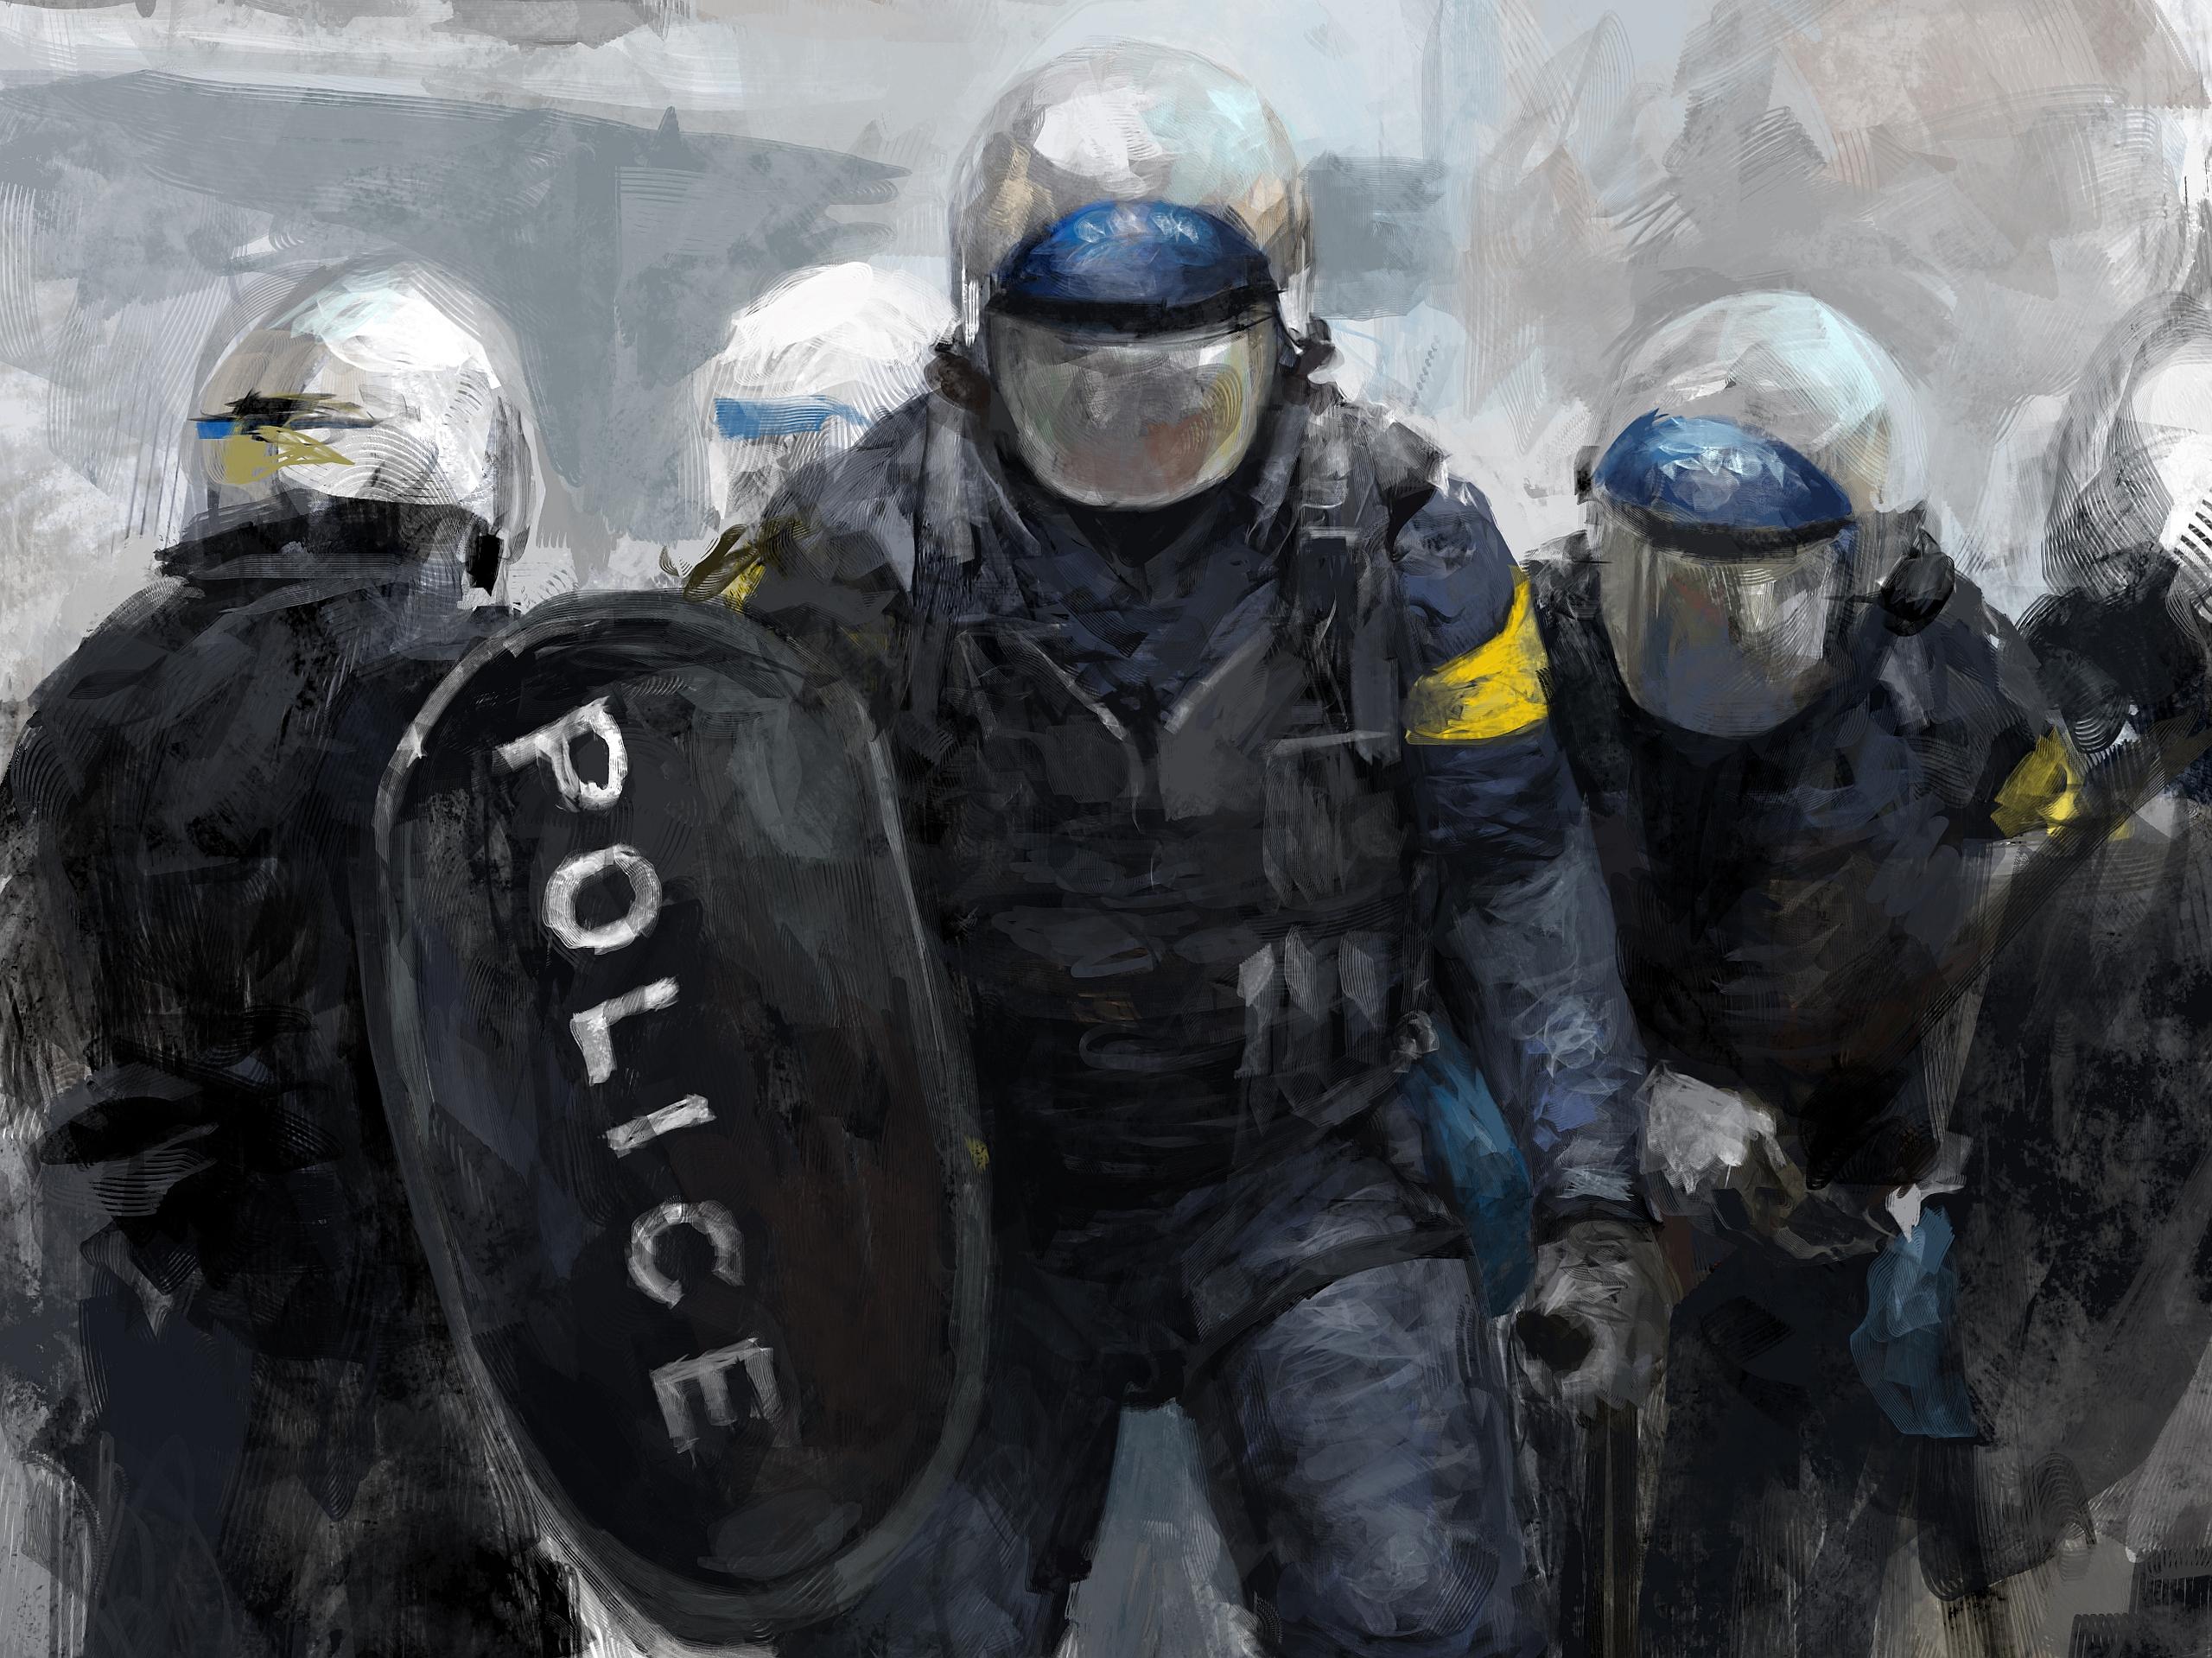 Police Computer Wallpapers Desktop Backgrounds 2560x1919 ID 2560x1919